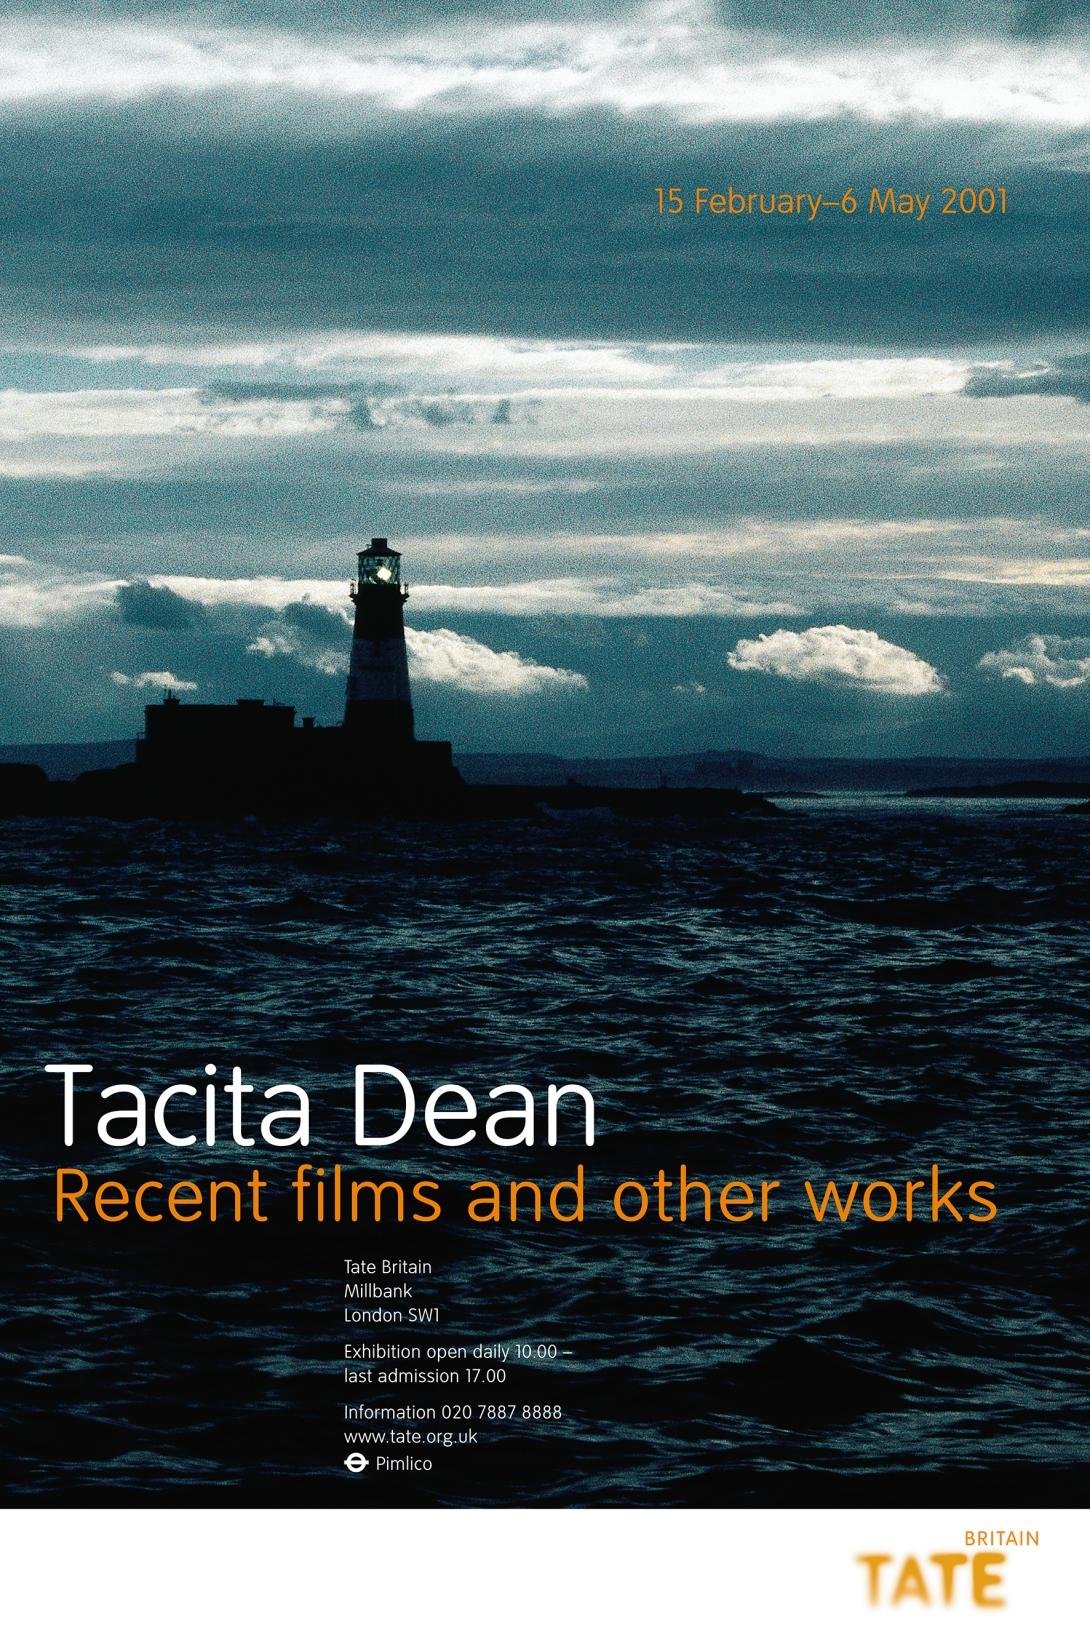 Tacita Dean/poster/chromalin